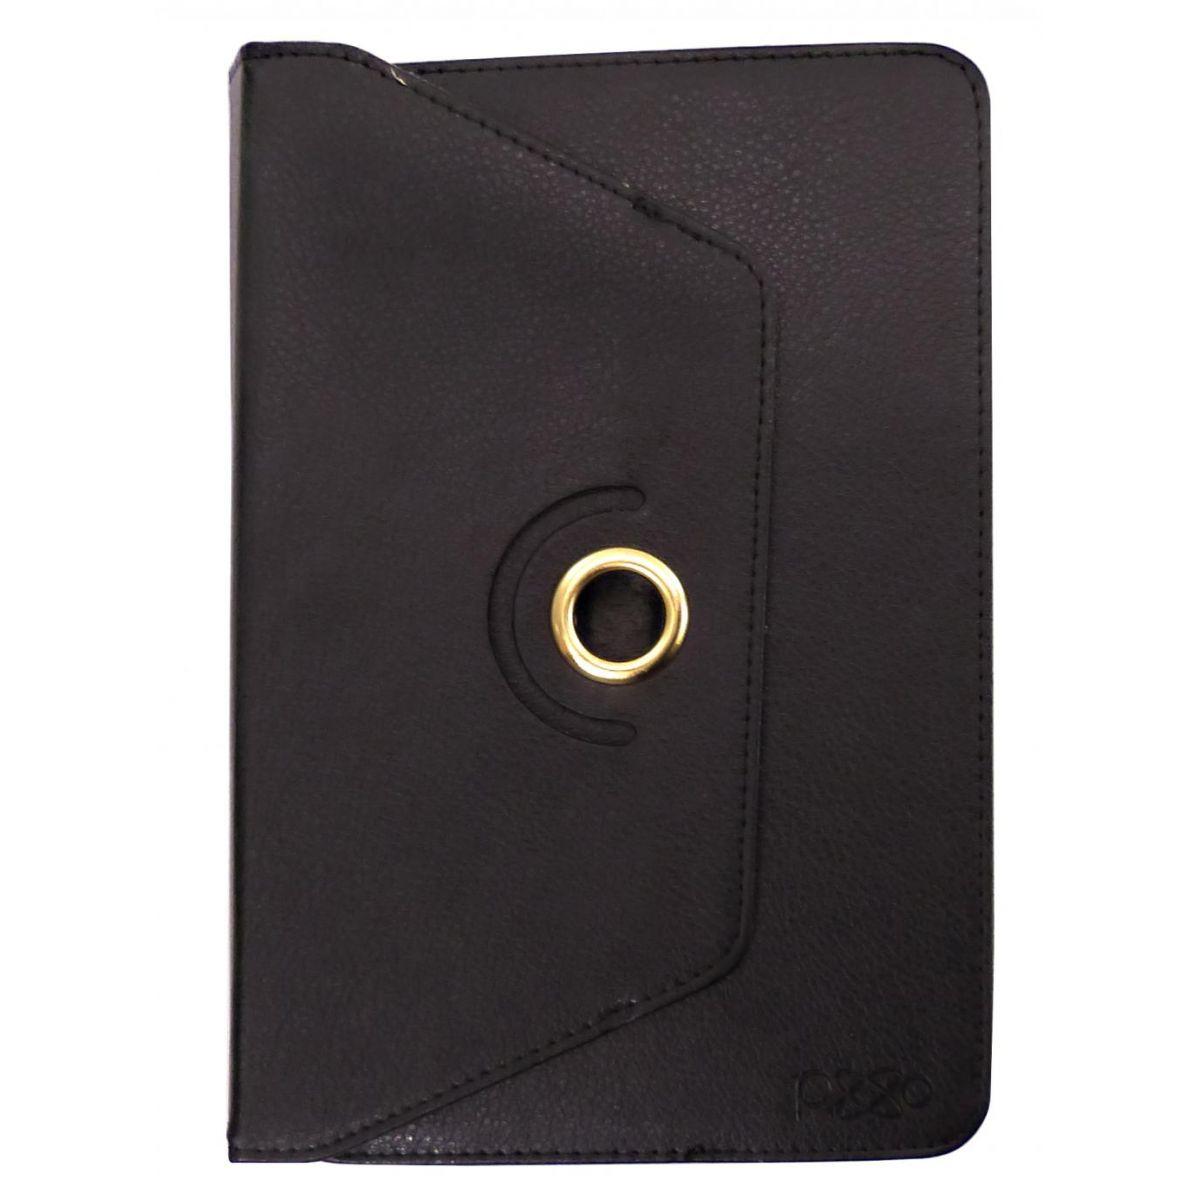 Capa Case em Couro Preto Para Tablet e Ipad 7 a 8 Polegadas Pixxo FC1161BPEB